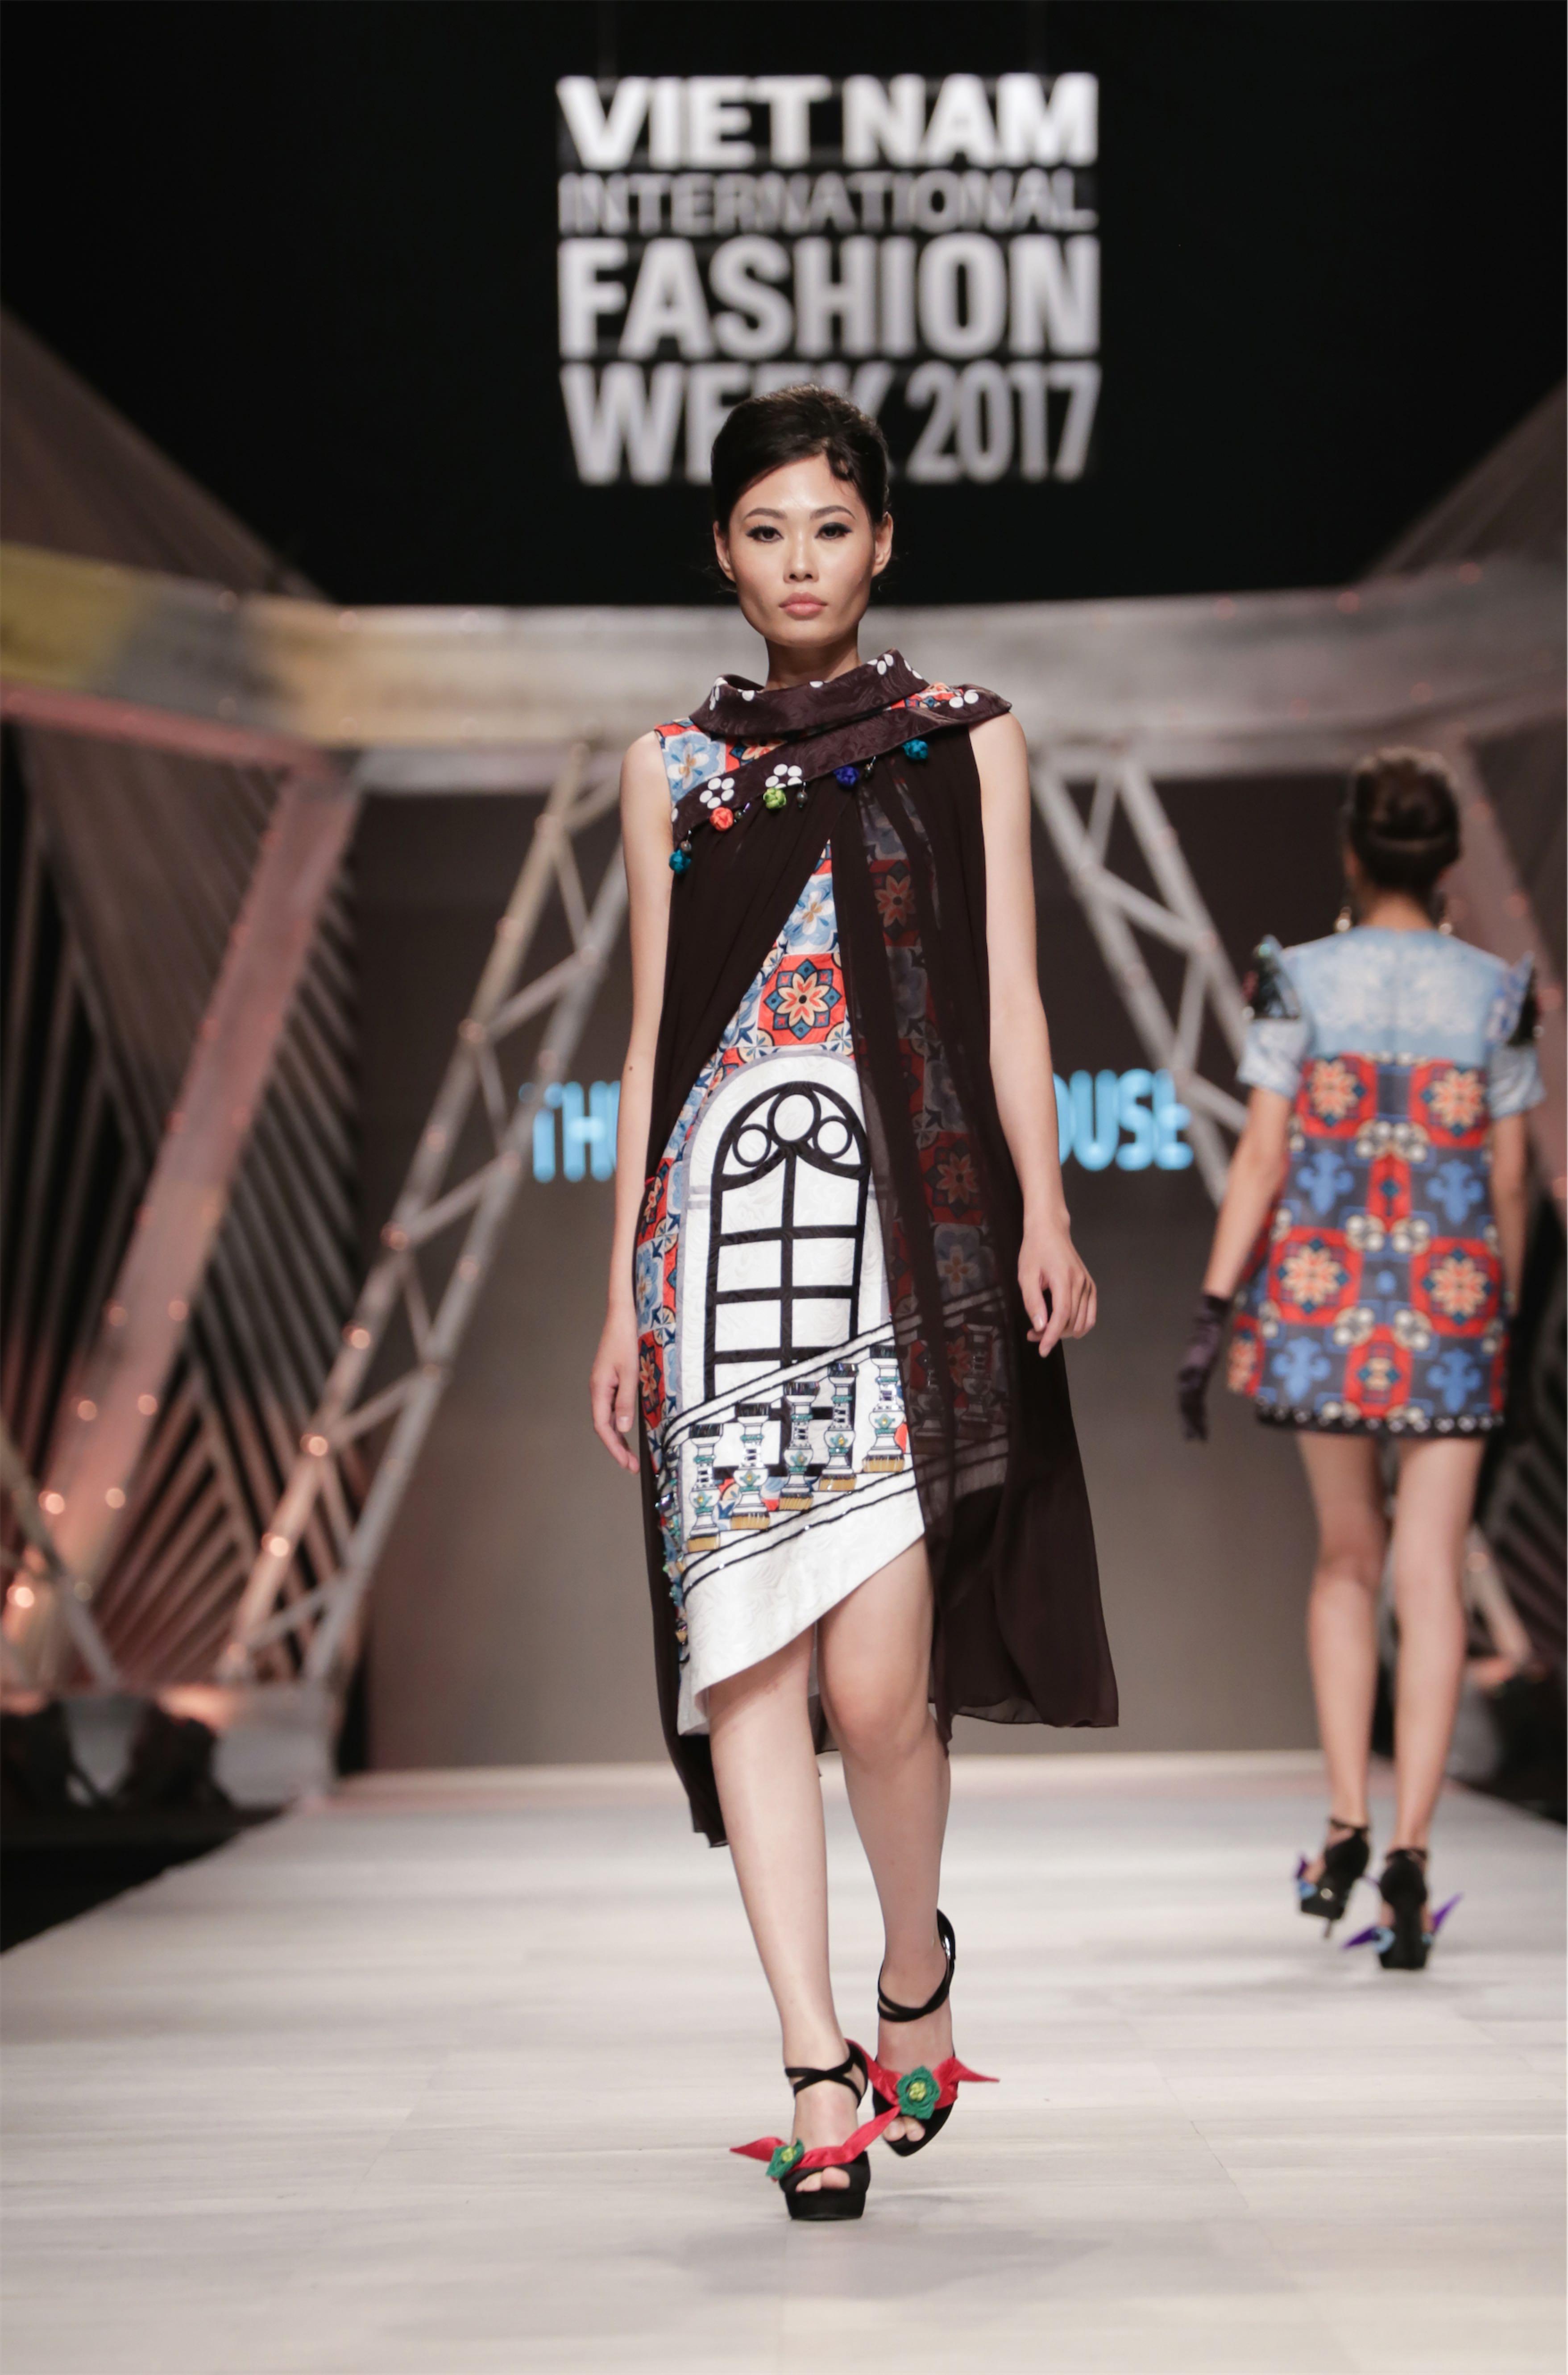 20171102-tuan-le-thoi-trang-quoc-te-viet-nam-17